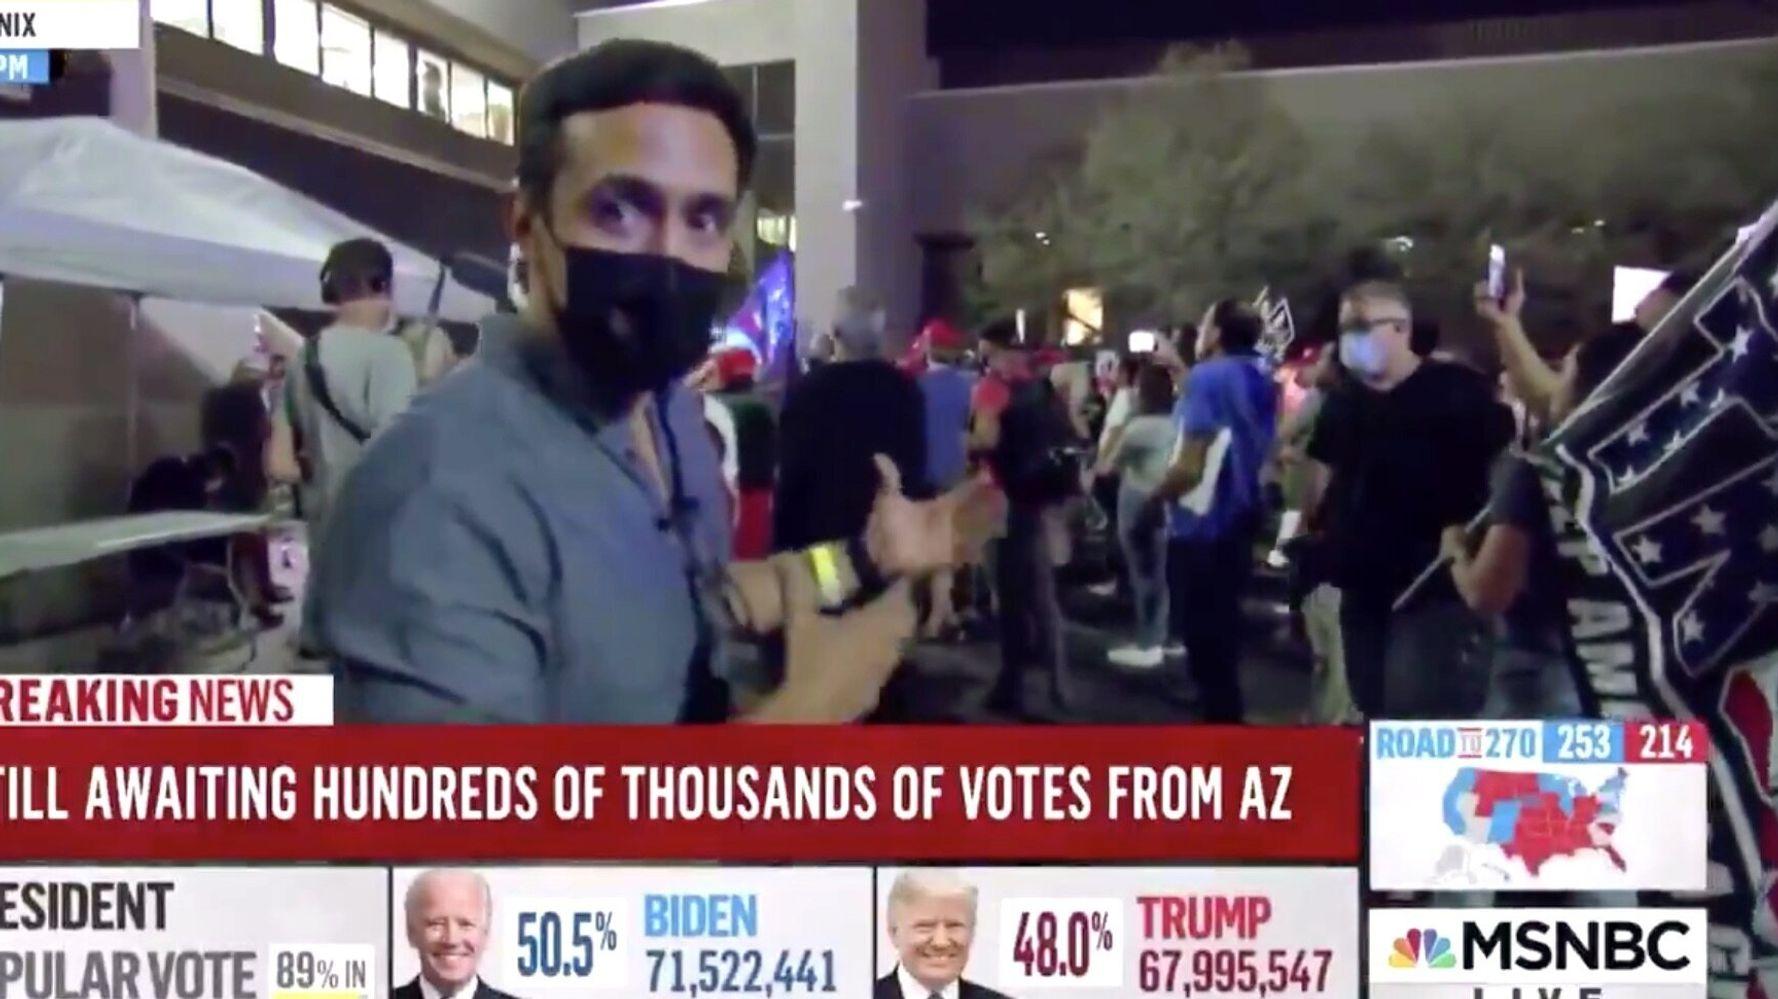 Trump Supporters Chant 'Fox News Sucks' On MSNBC In Surreal Scene In Arizona